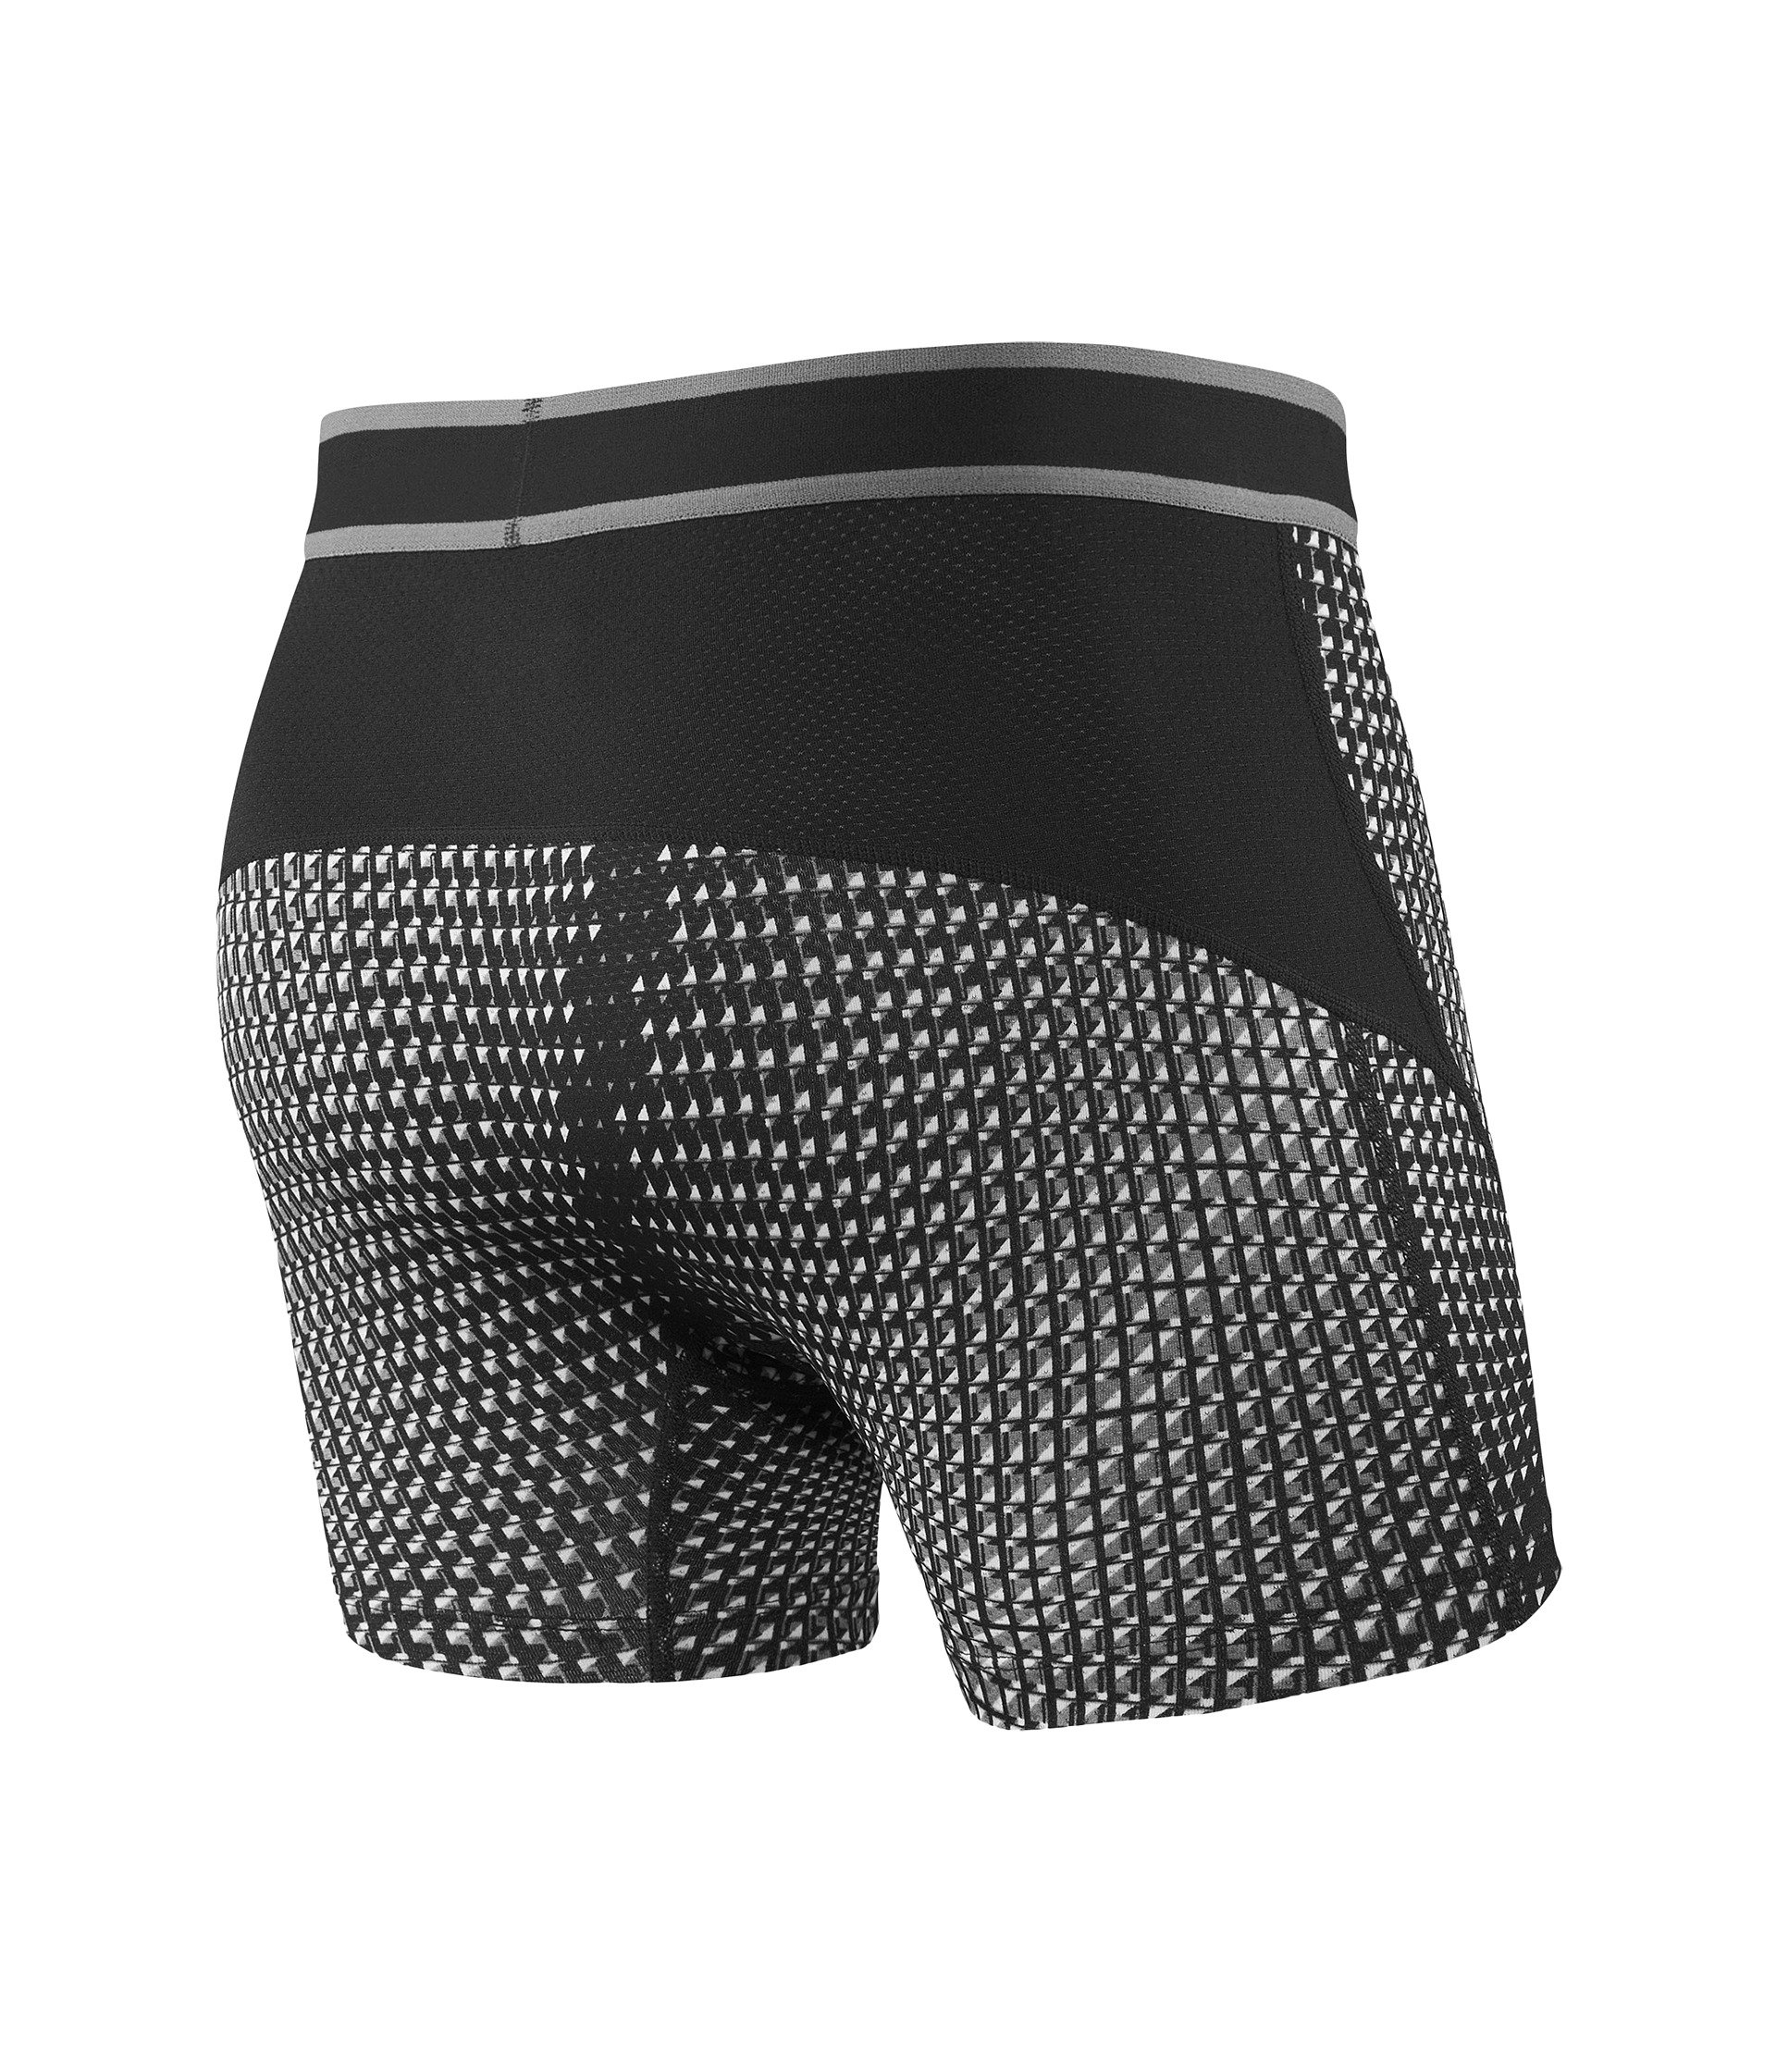 Skyscraper Underwear Kinetic Saxx Grey Boxer wzIAq7